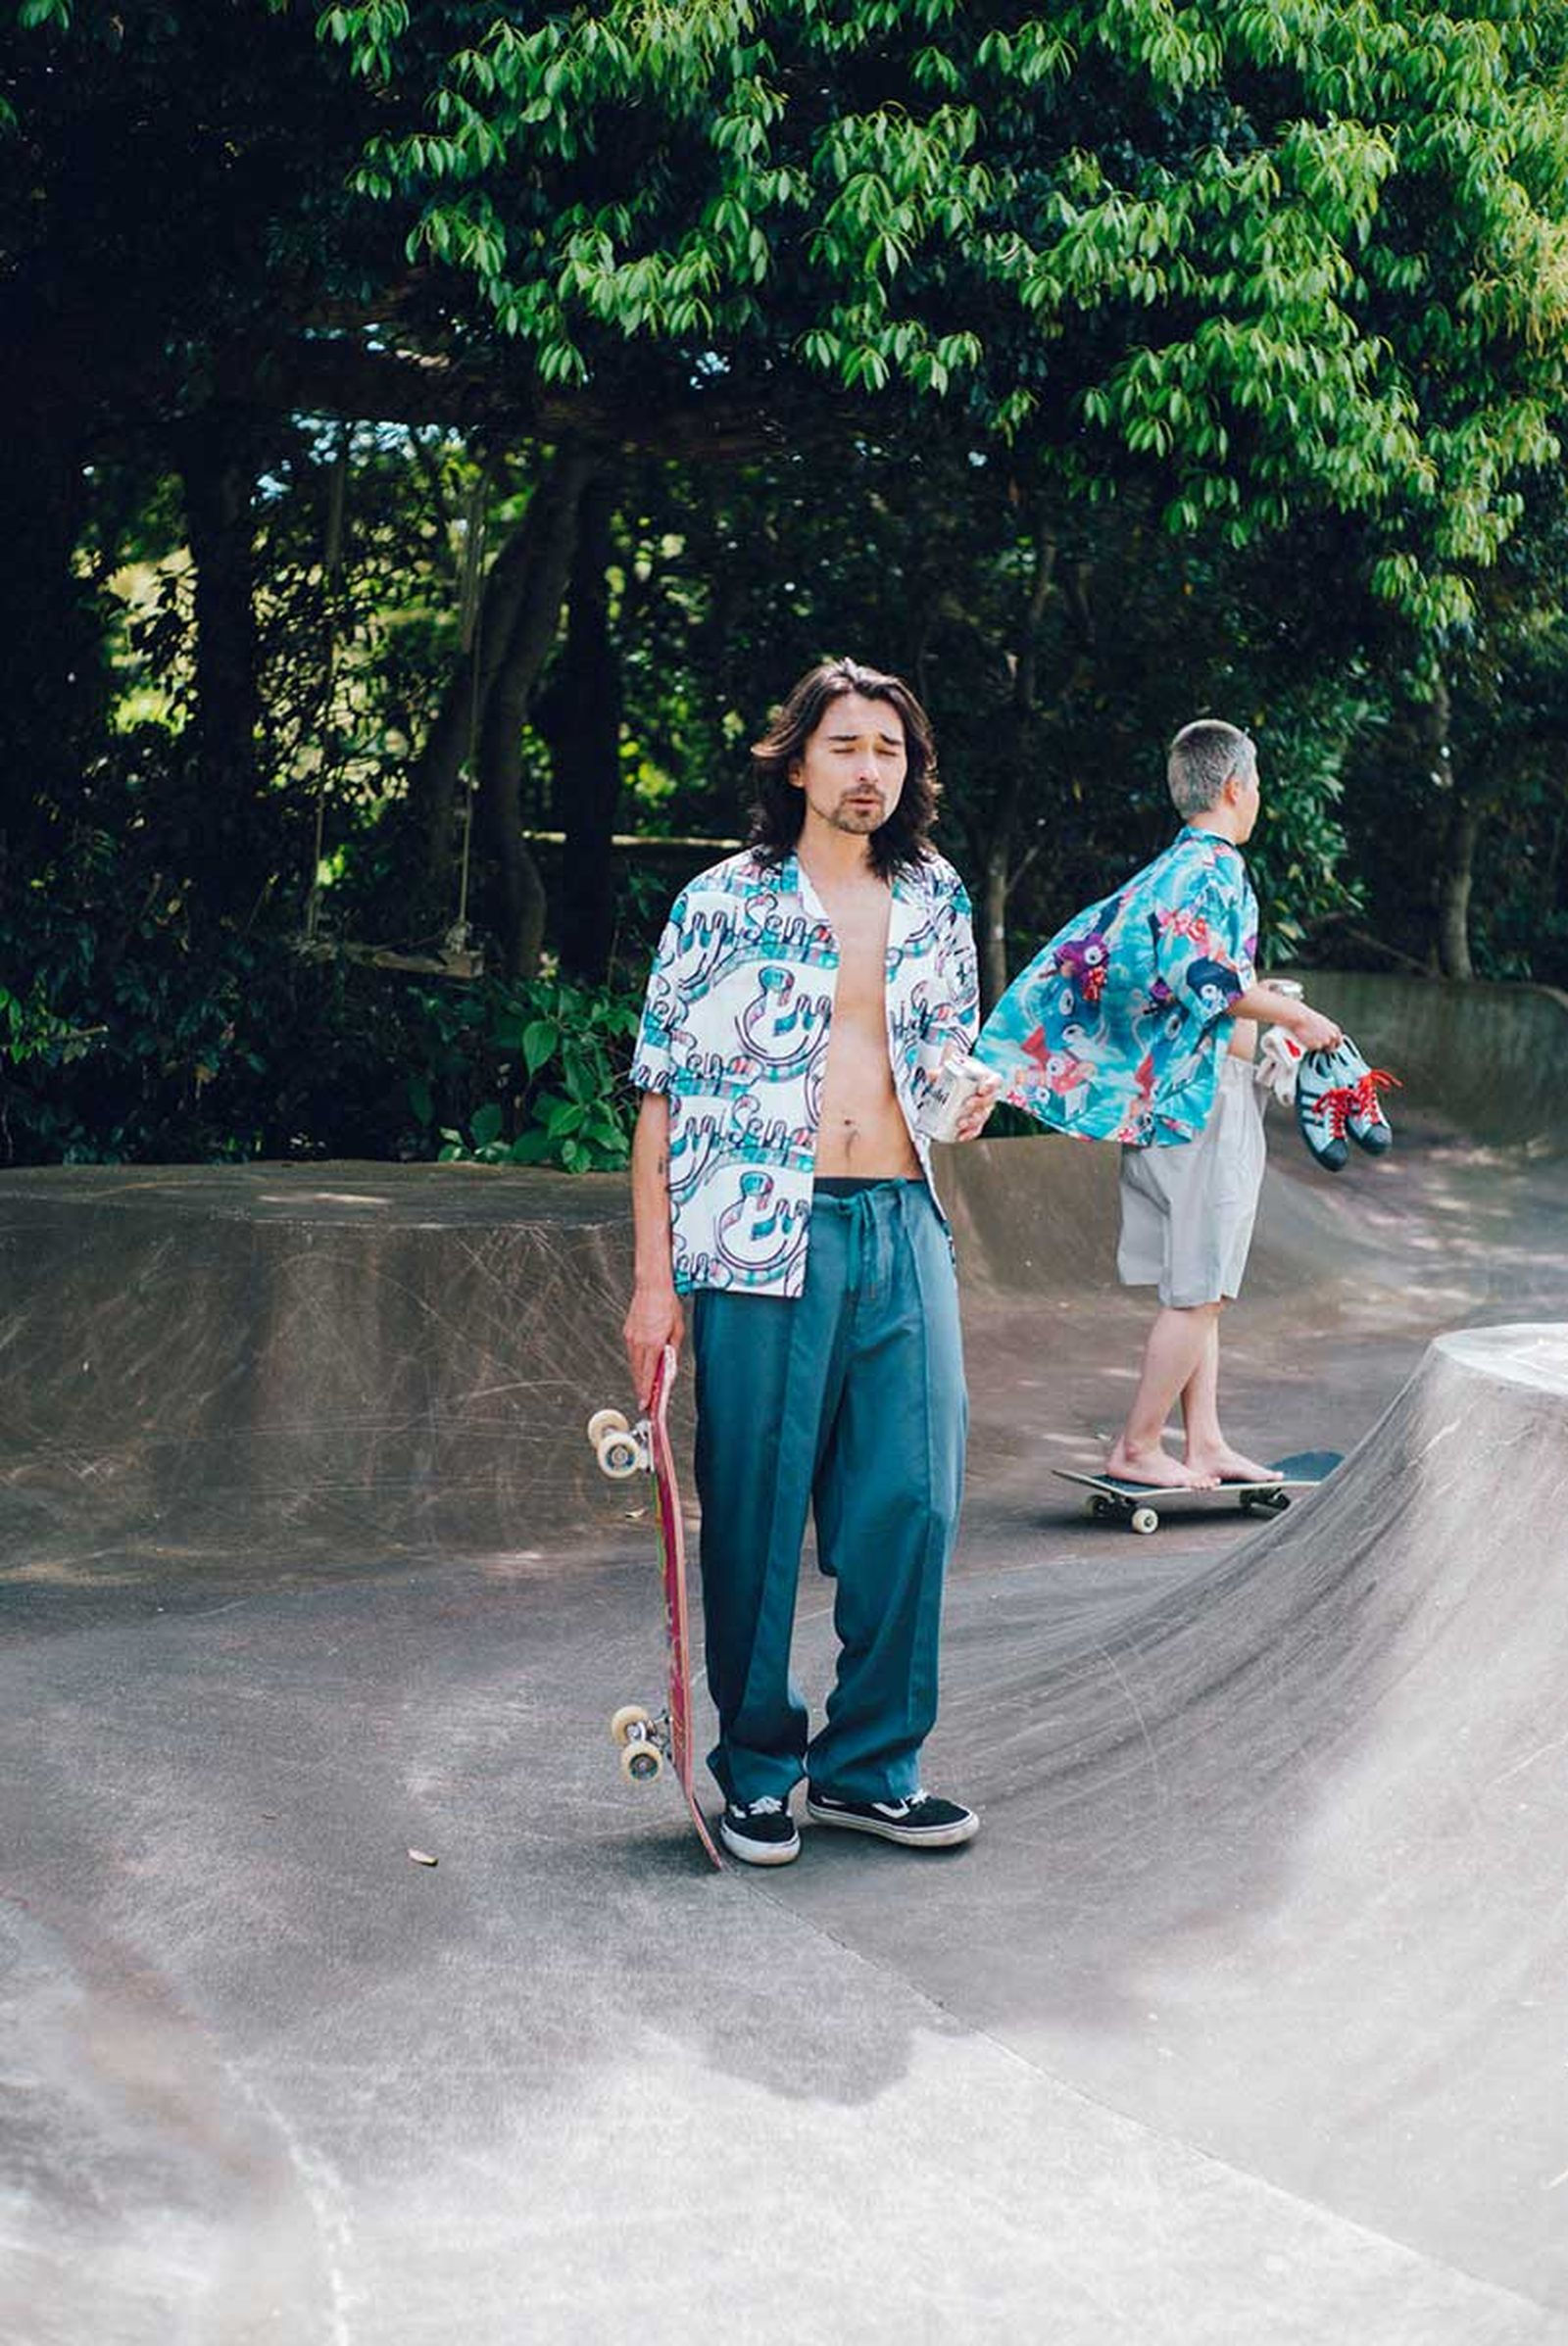 evisen-skateboards-summer-2021-(4)